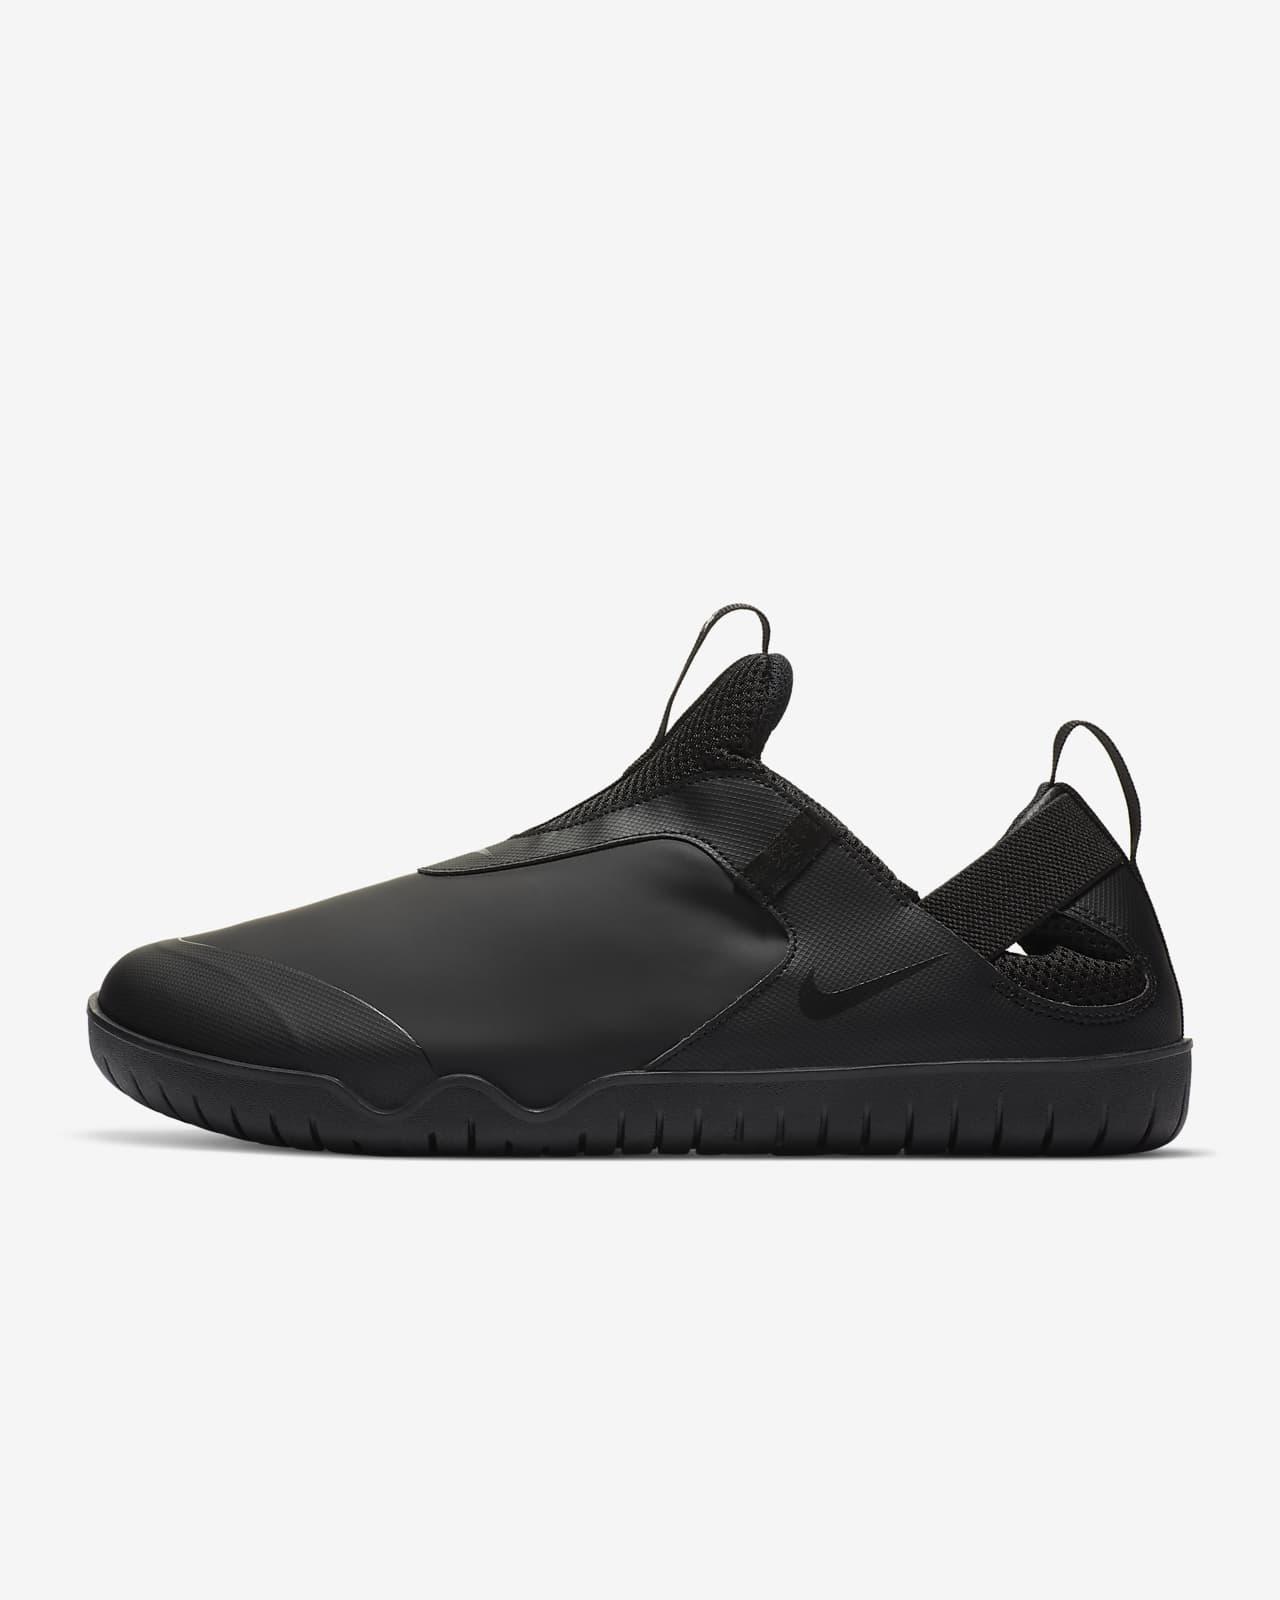 Nike Air Zoom Pulse Schoen